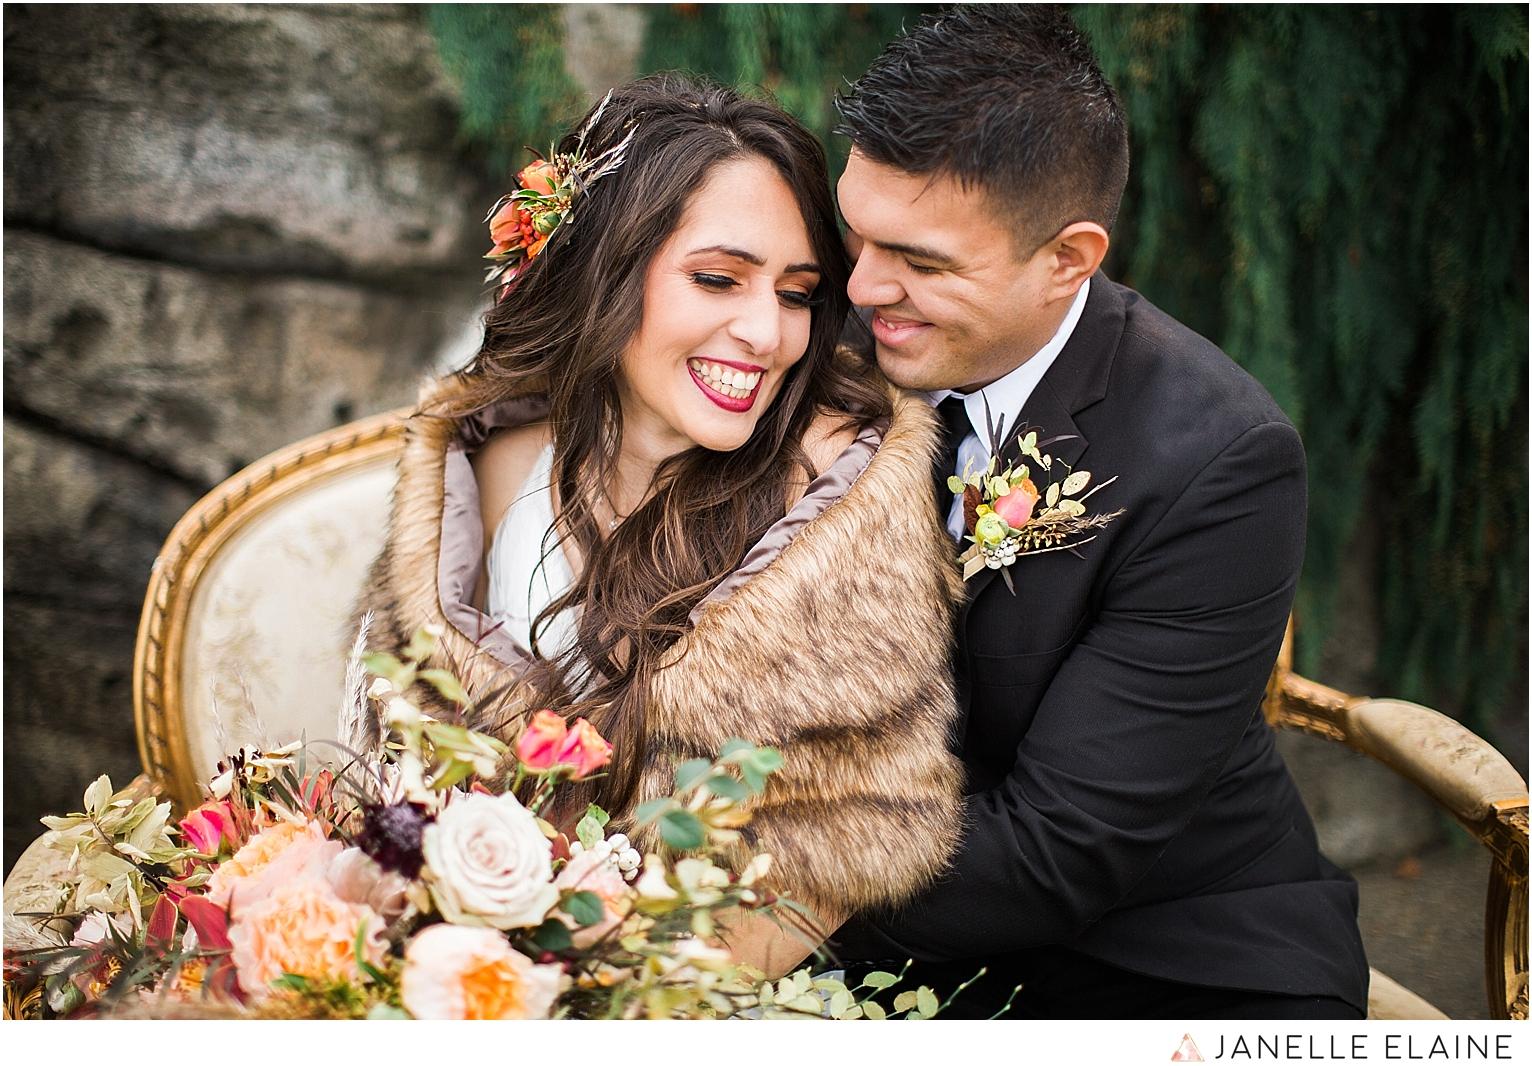 elopement-wedding-photographer-seattle washington-photographers-61.jpg